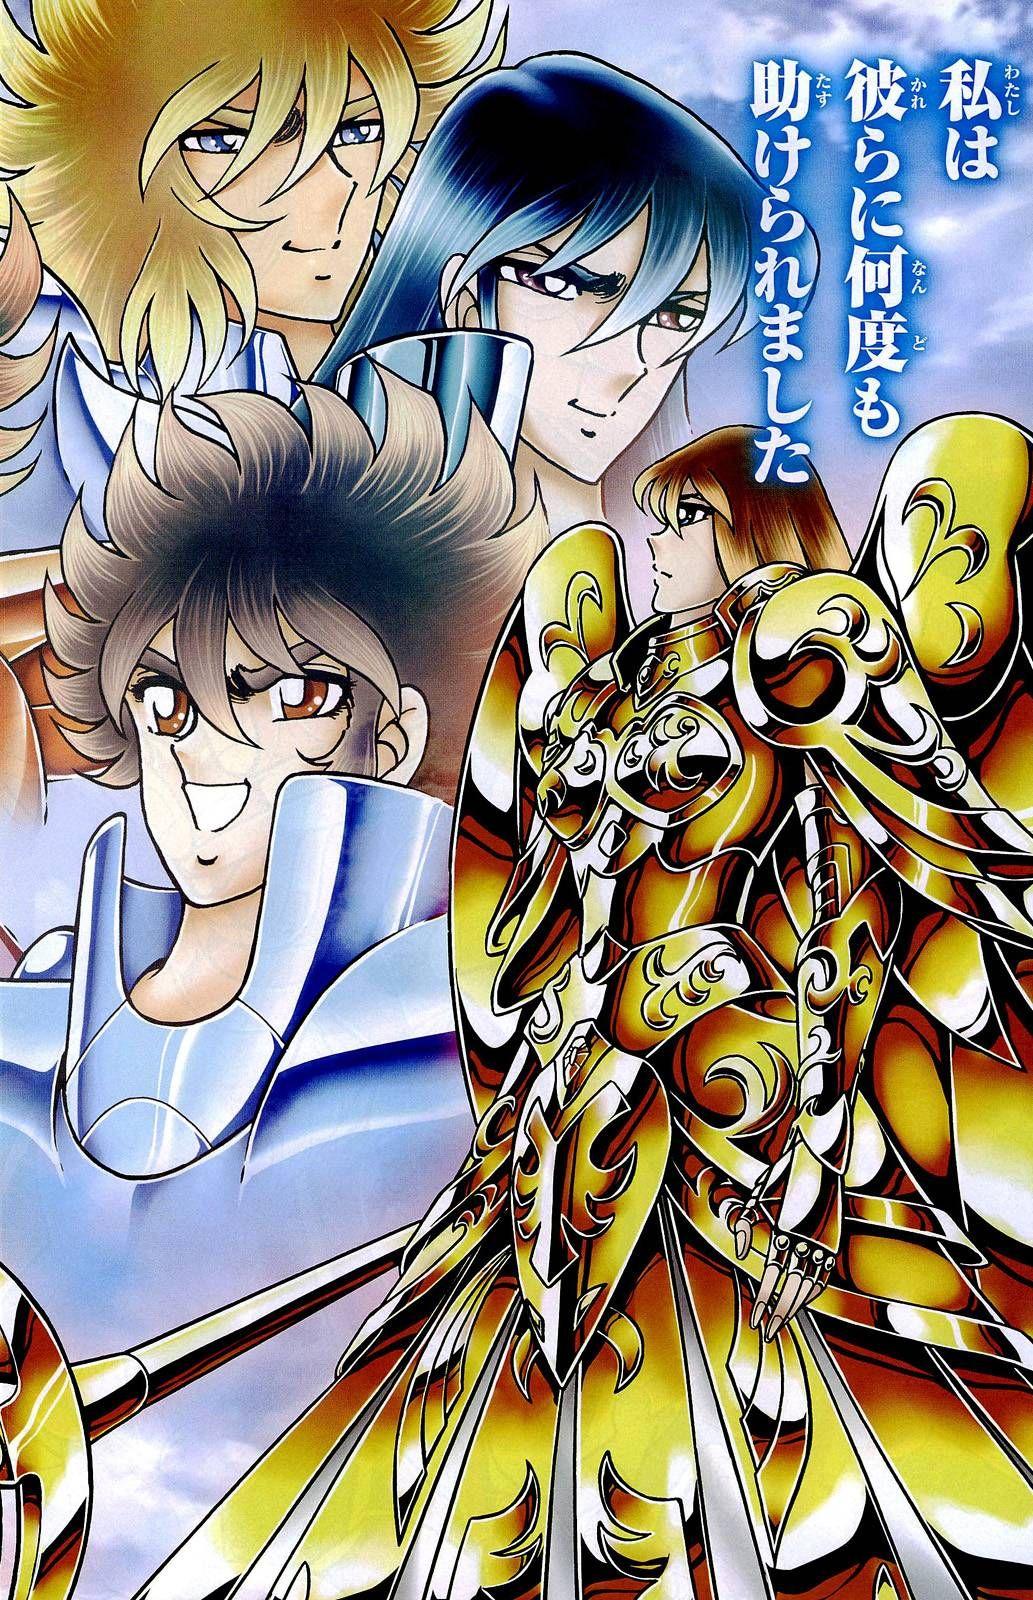 Saint Seiya Next Dimension, Weekly Champion 29 2014, page